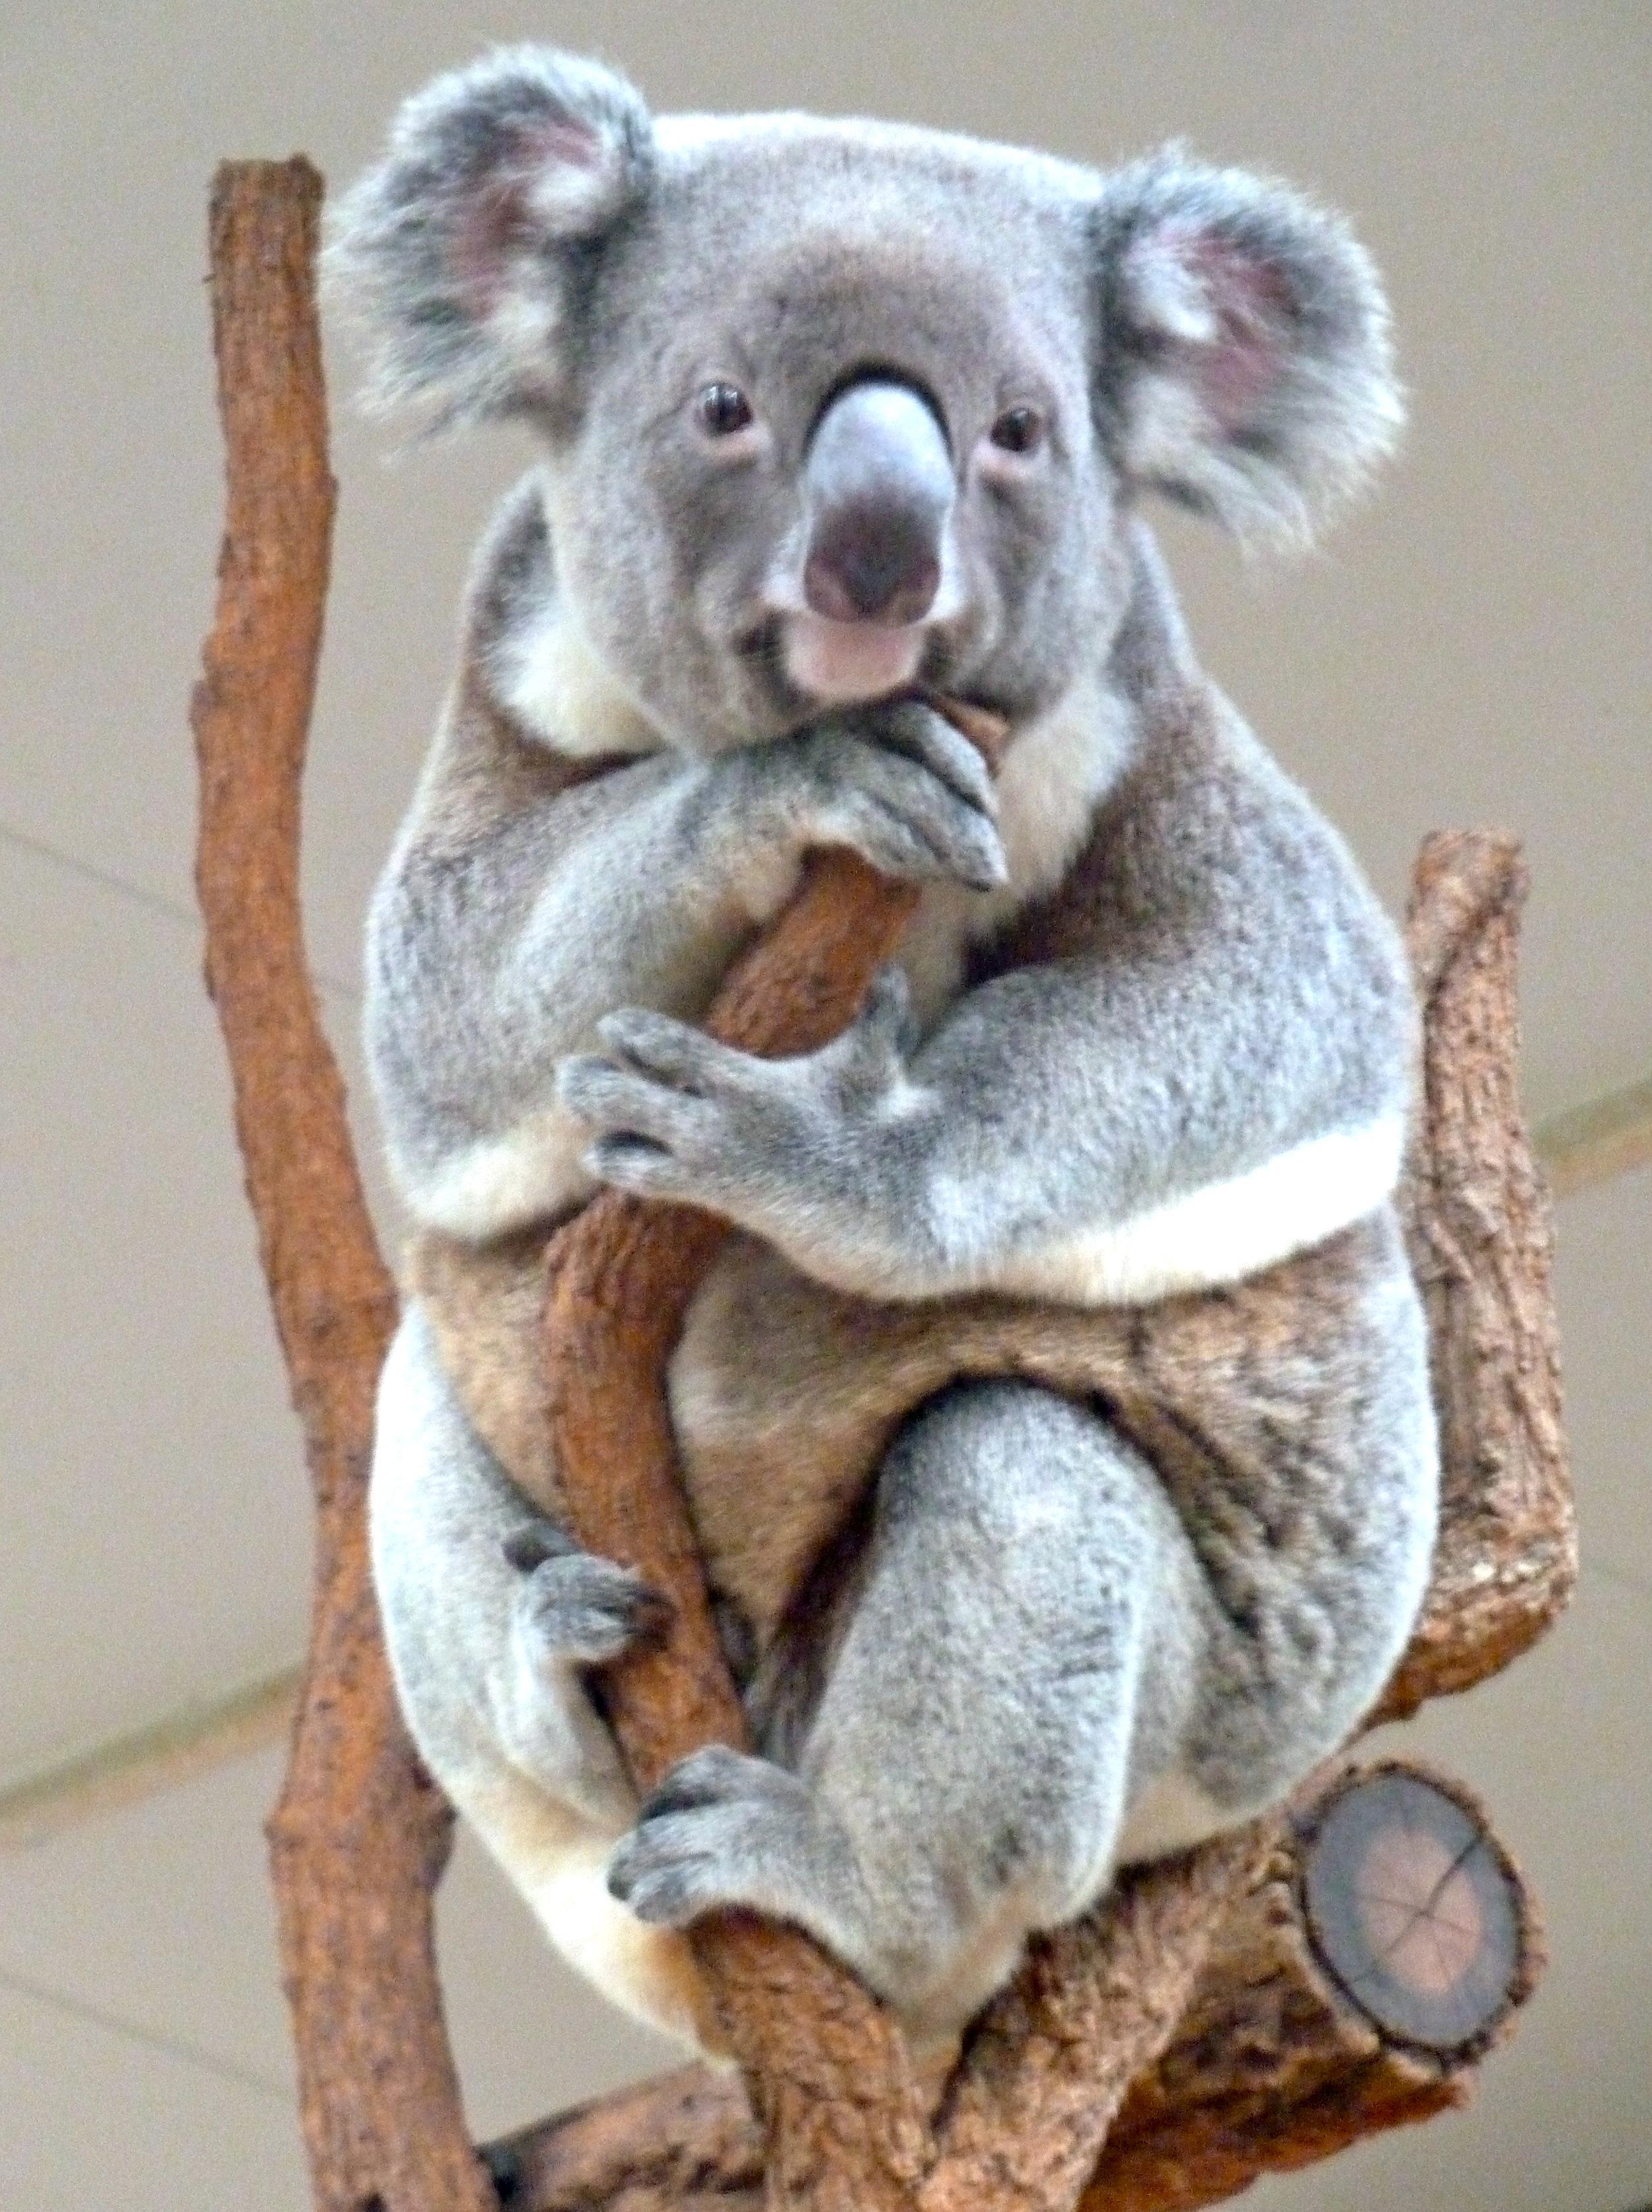 Oct:  inhabitant of the Lone Pine Koala Sanctuary, Brisbane